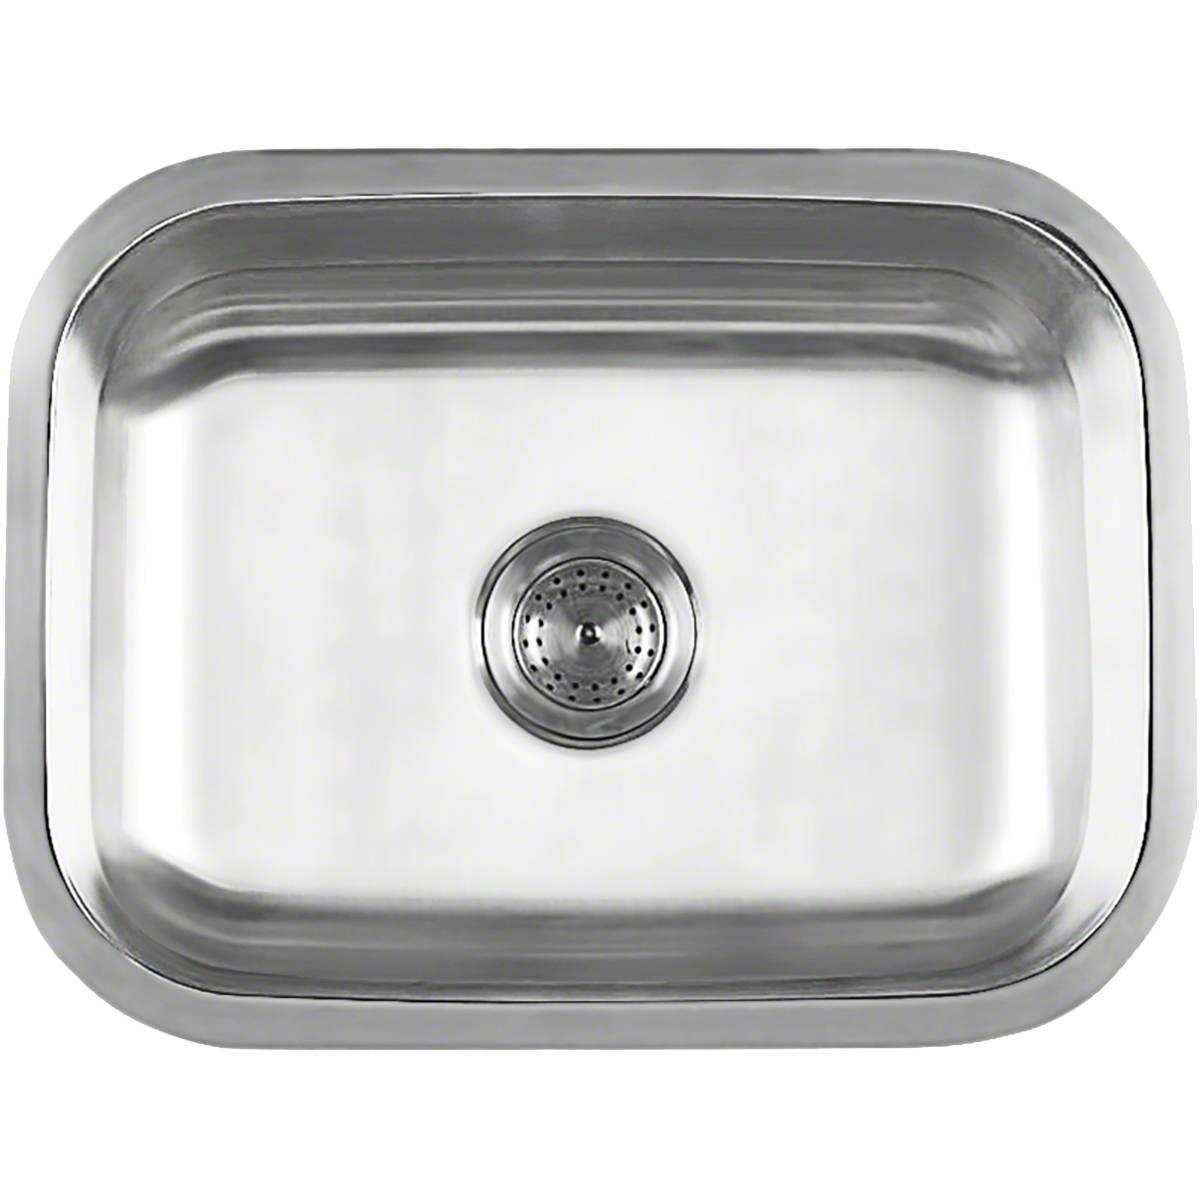 Sinks -ss-18-gau-single-bowl-2318-SIN-18-SINBWL-2318